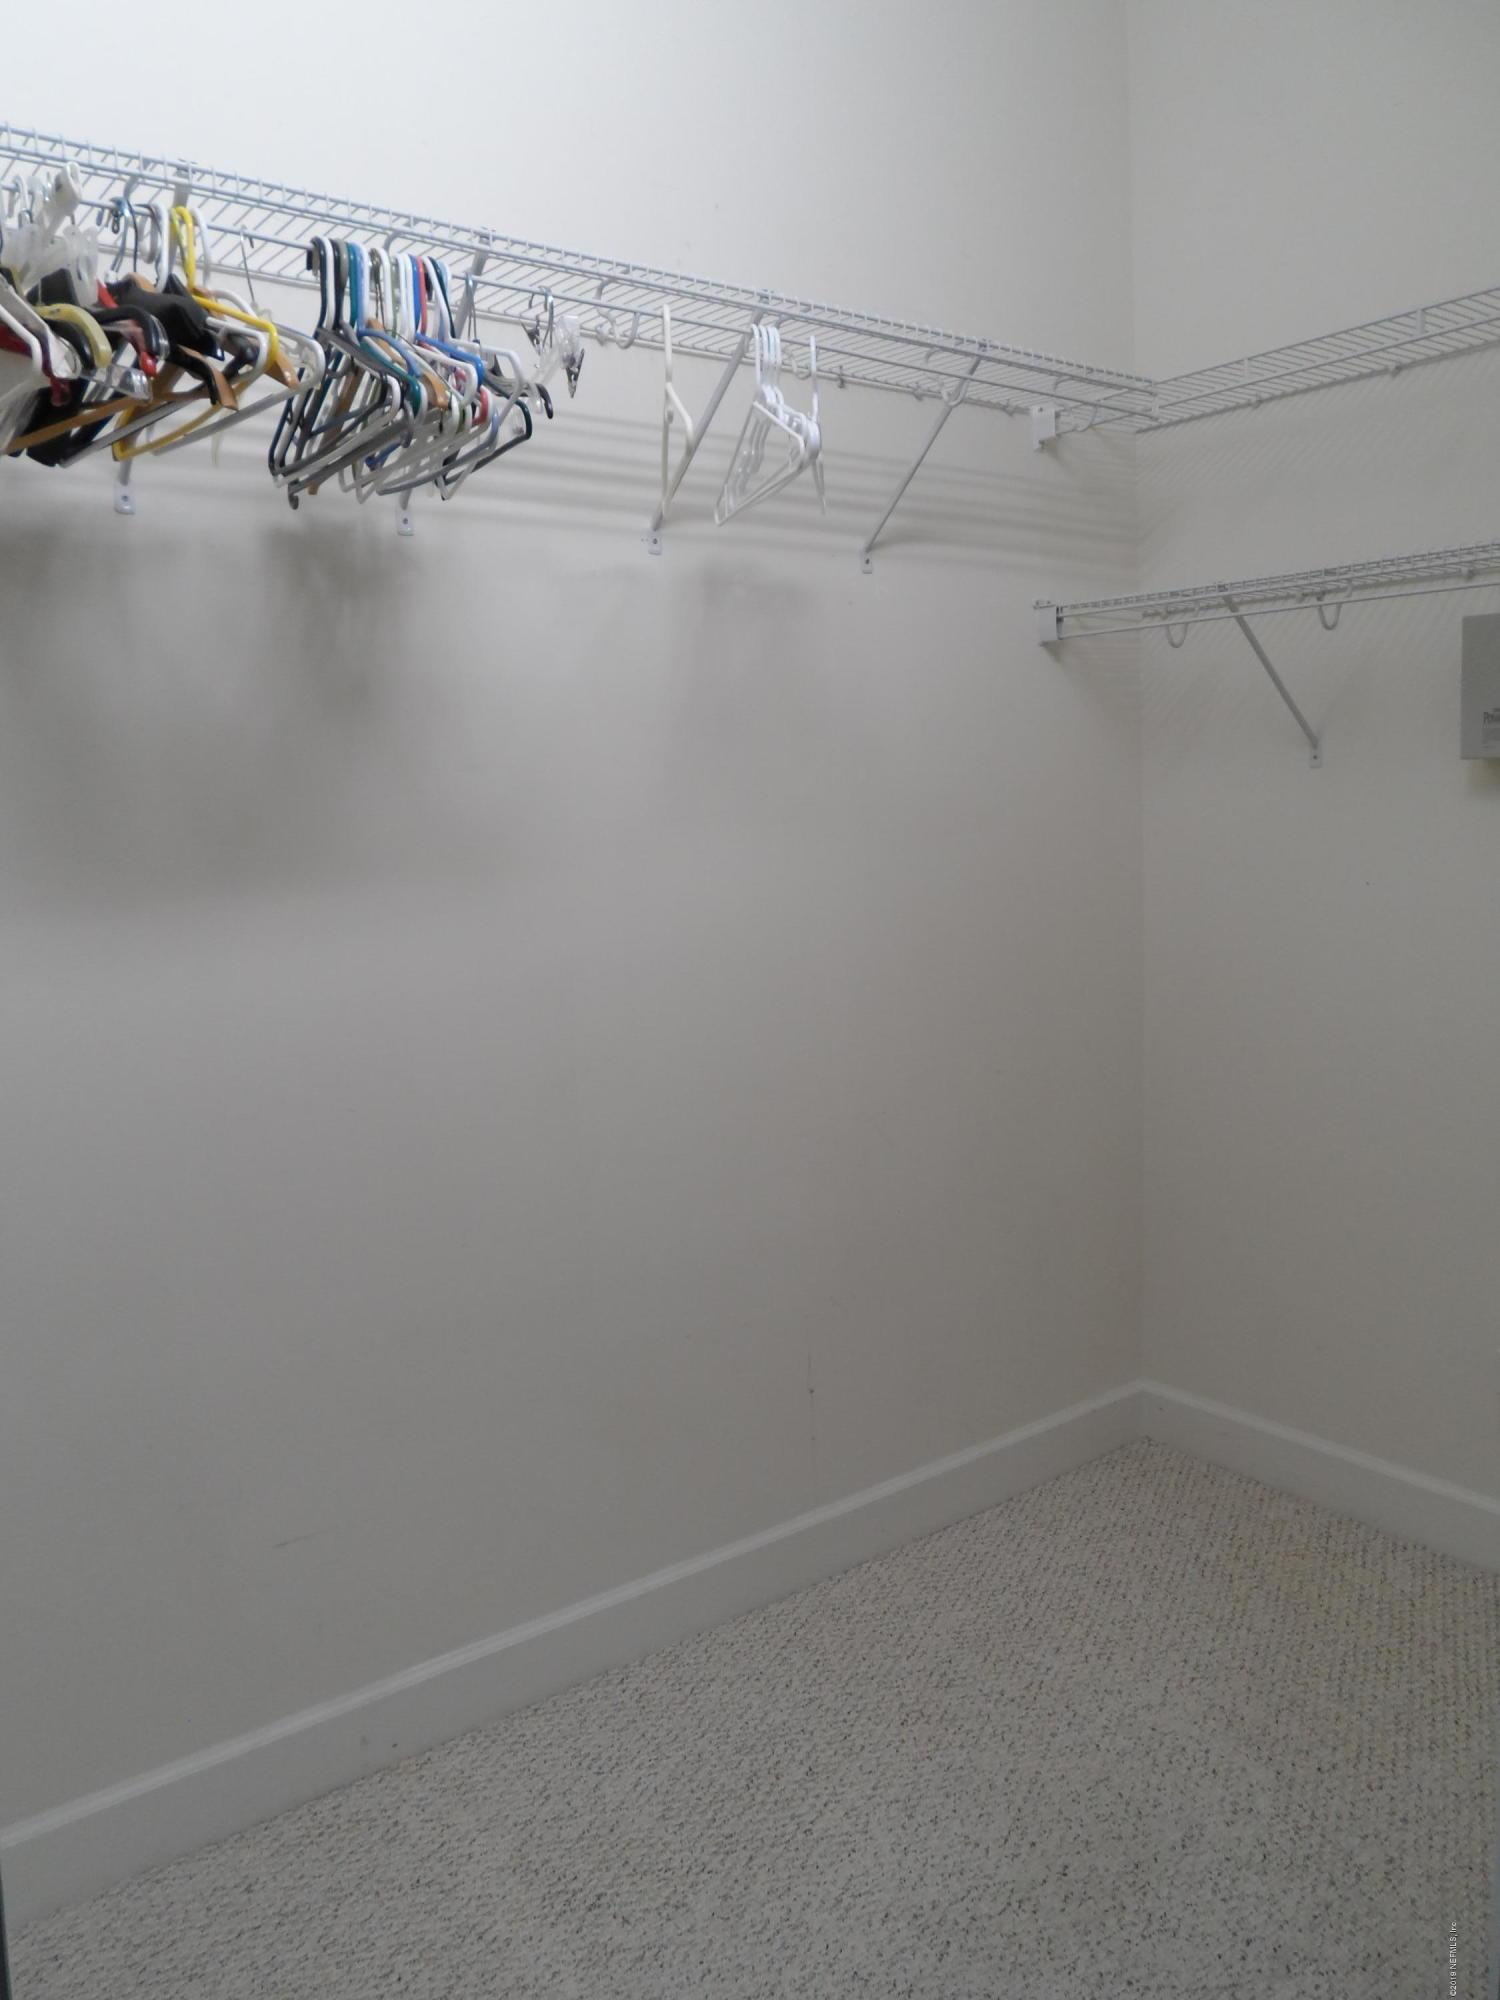 1105 INVERNESS, ST AUGUSTINE, FLORIDA 32092, 3 Bedrooms Bedrooms, ,2 BathroomsBathrooms,Rental,For sale,INVERNESS,1027512